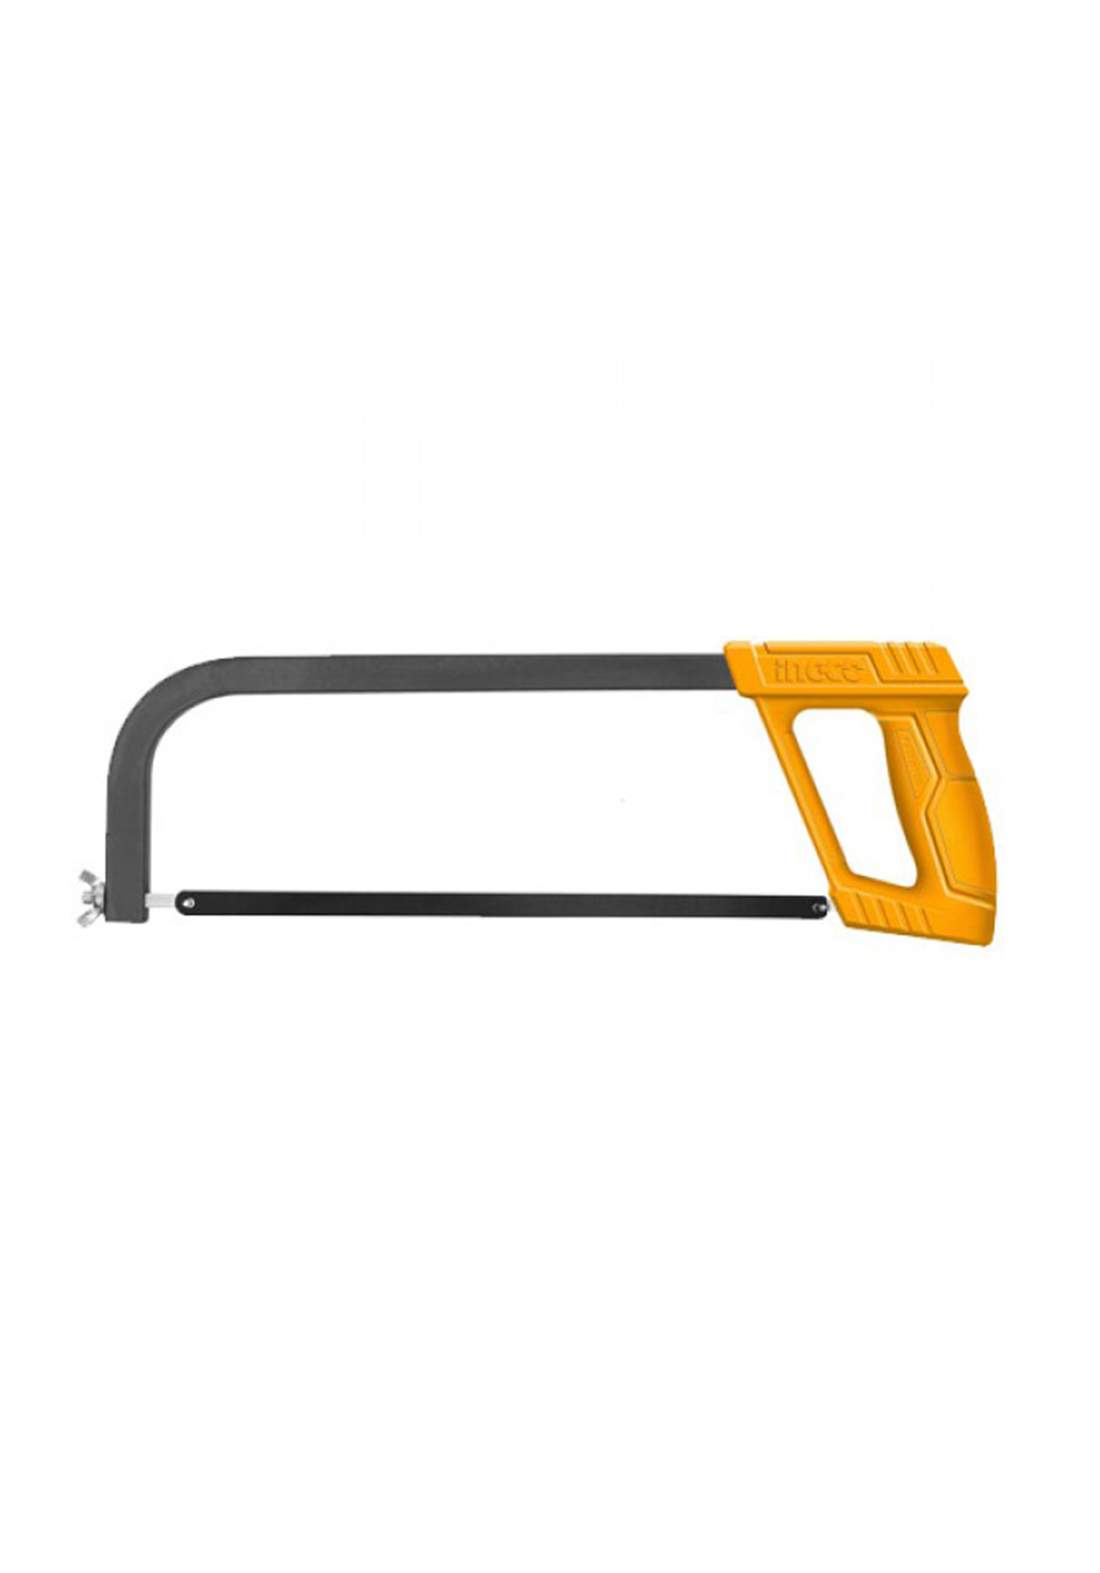 Ingco HHF3038 Hacksaw Frame 300mm  منشار حديد مقبض بلاستيك